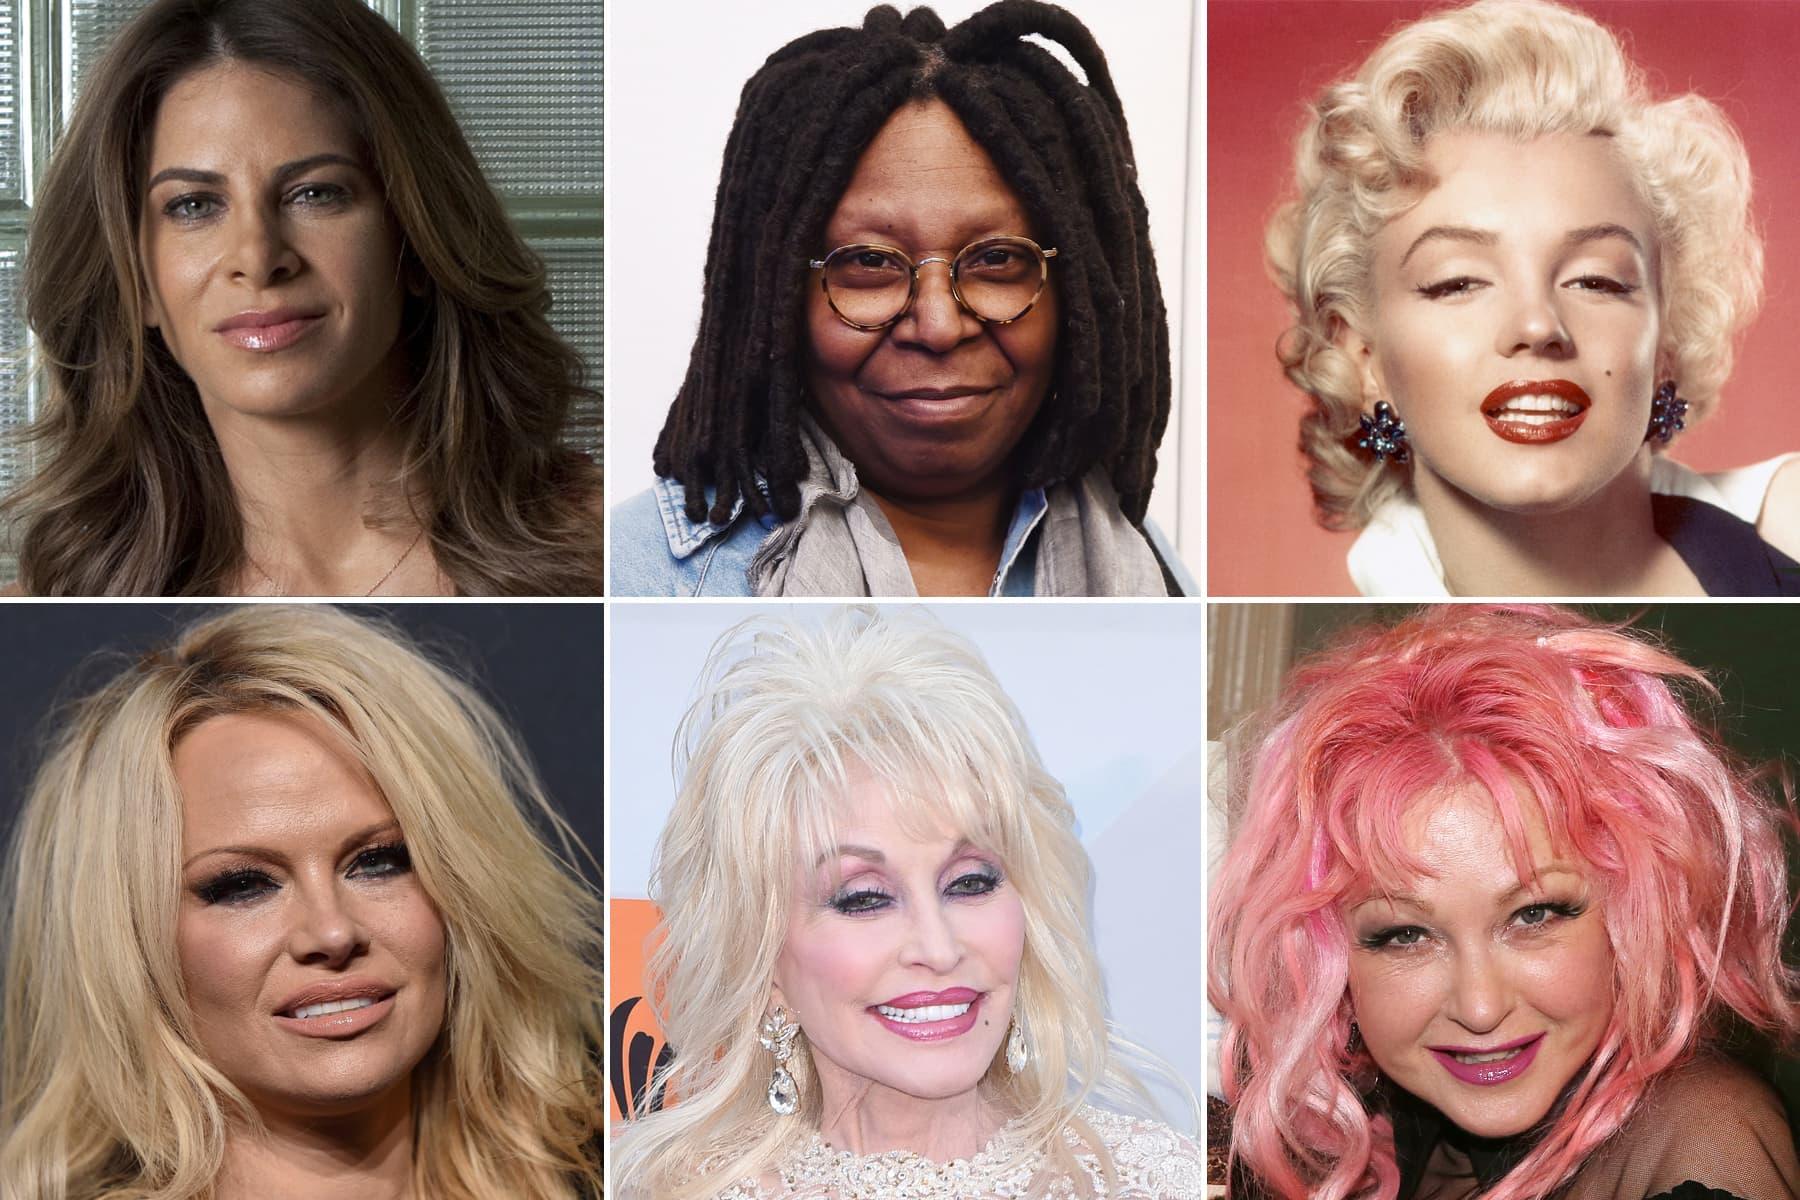 Celebrities who have suffered from endometriosis: Jillian Michaels, Whoopi Golberg, Marilyn Monroe, Pamela Anderson, Dolly Parton, Cyndi Lauper.